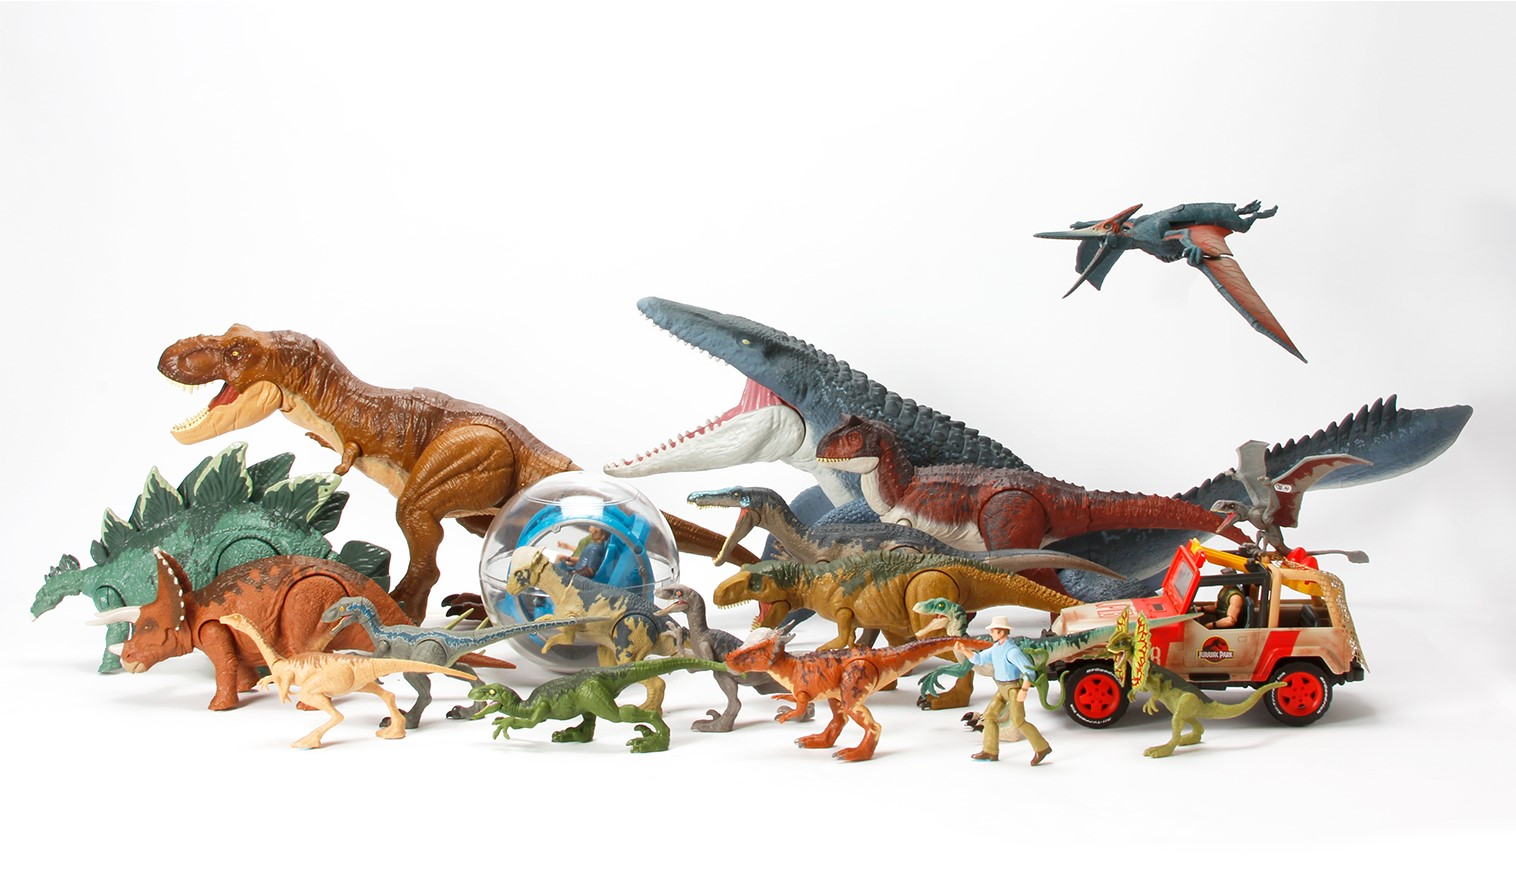 Mattel Jurassic WorldΓäó Dinosaur Action Figures